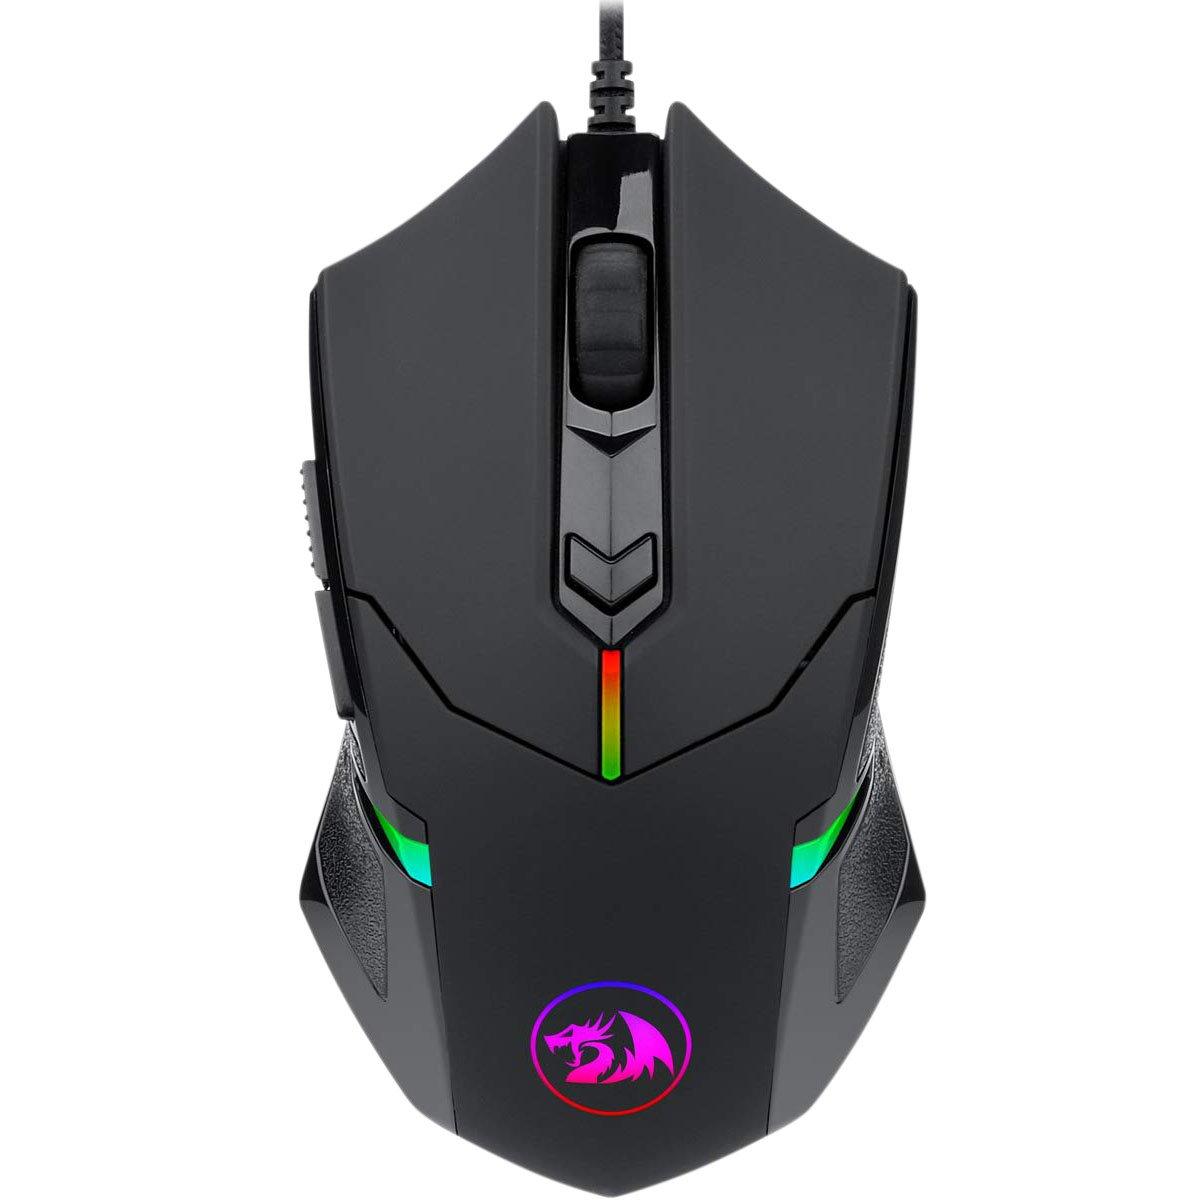 mouse usb gamer redragon centrophorus 2 m601 rgb 7200dpi preto 50953 2000 202844